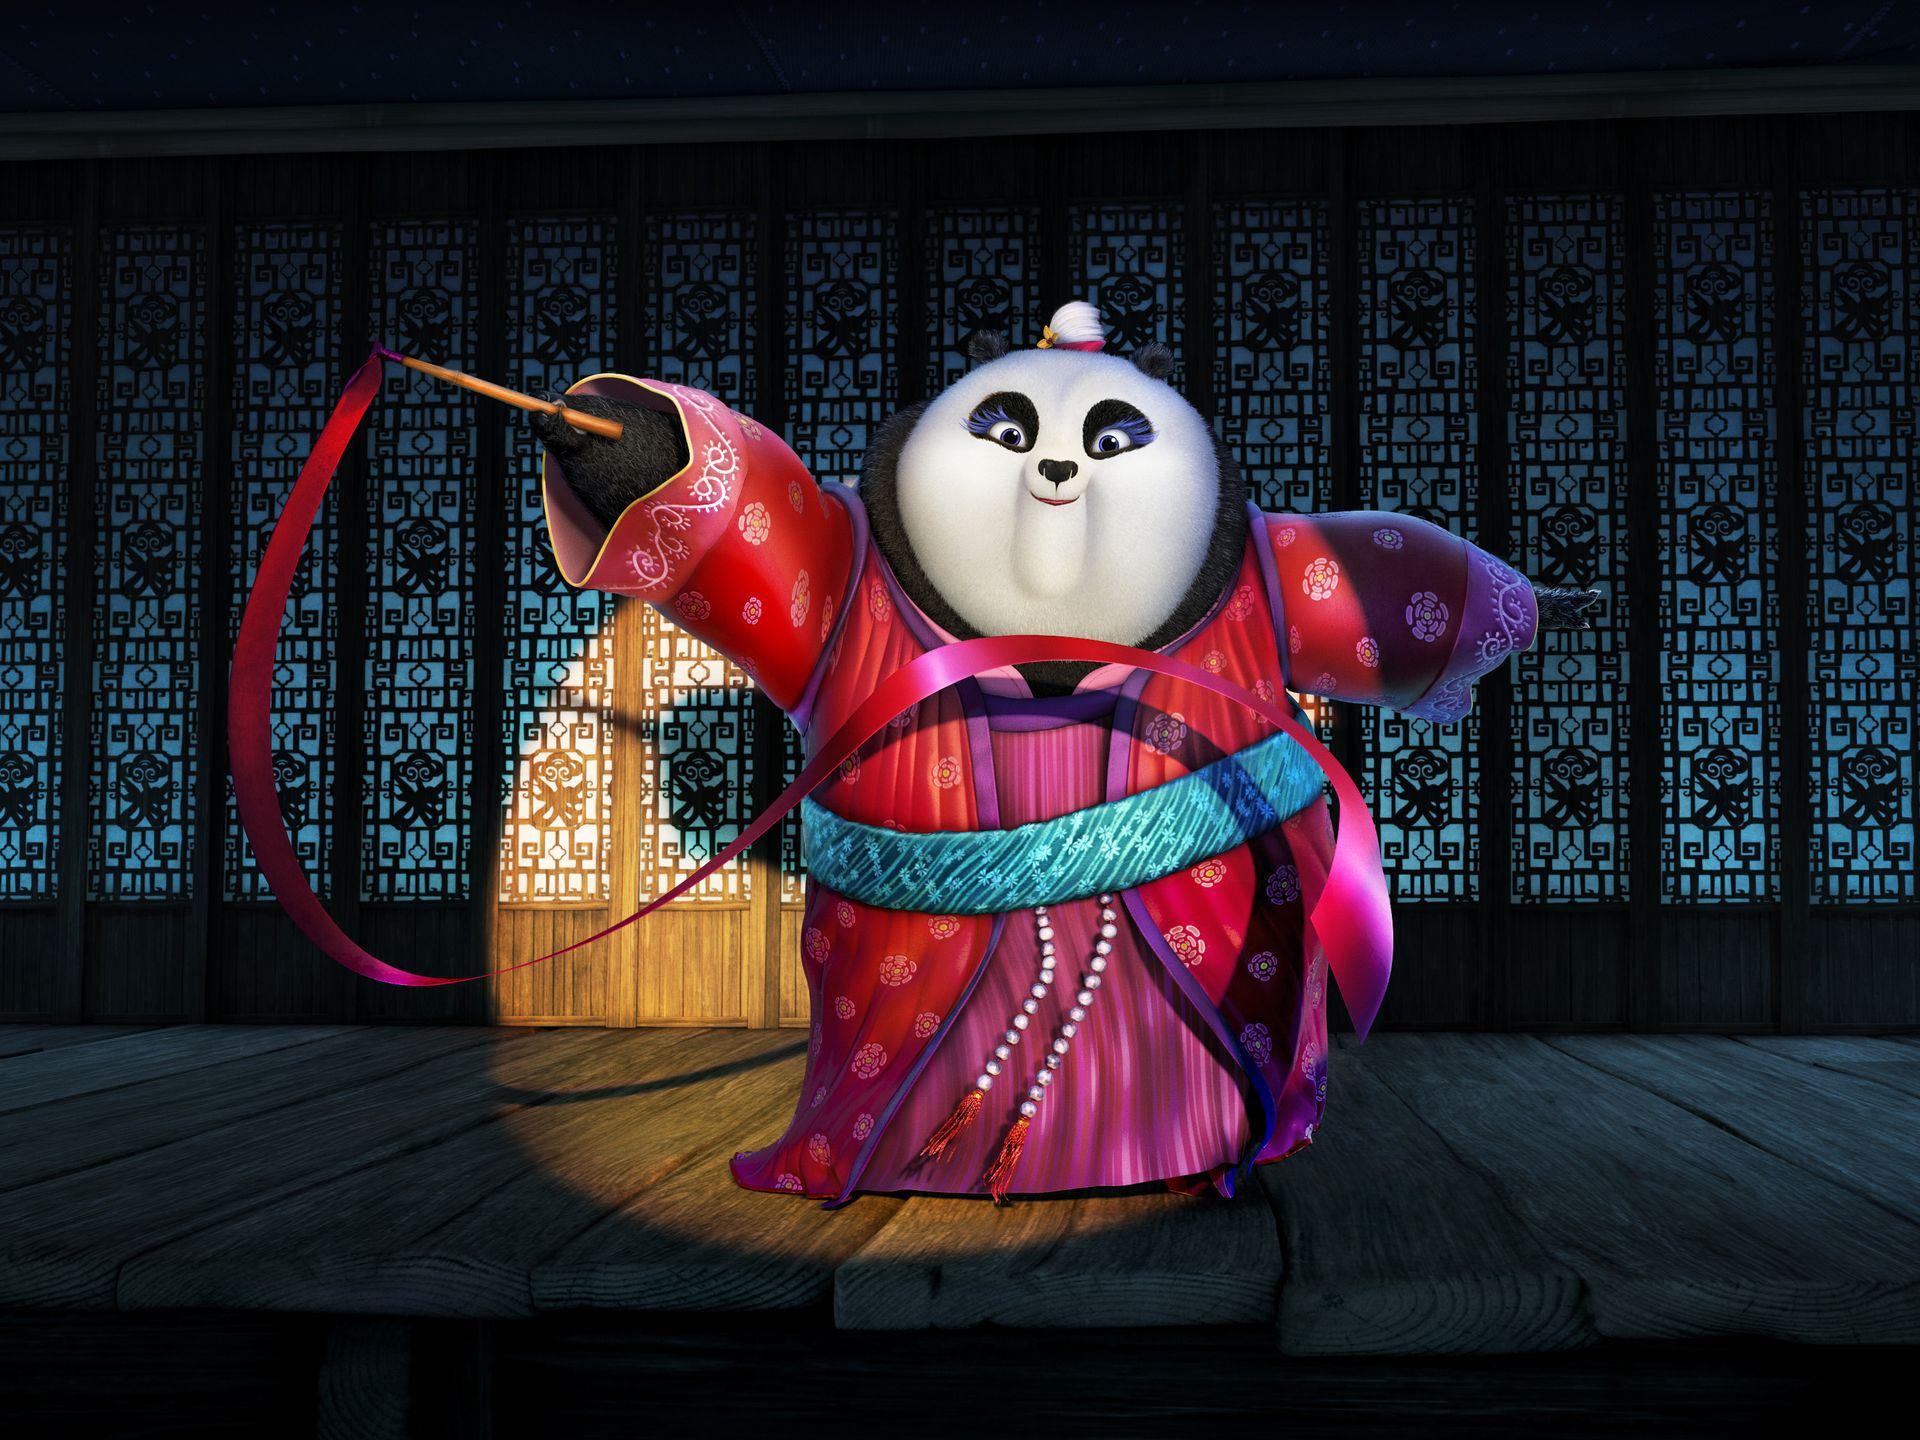 Kung Fu Panda 3, Mei Mei, Rebel Wilson, photo